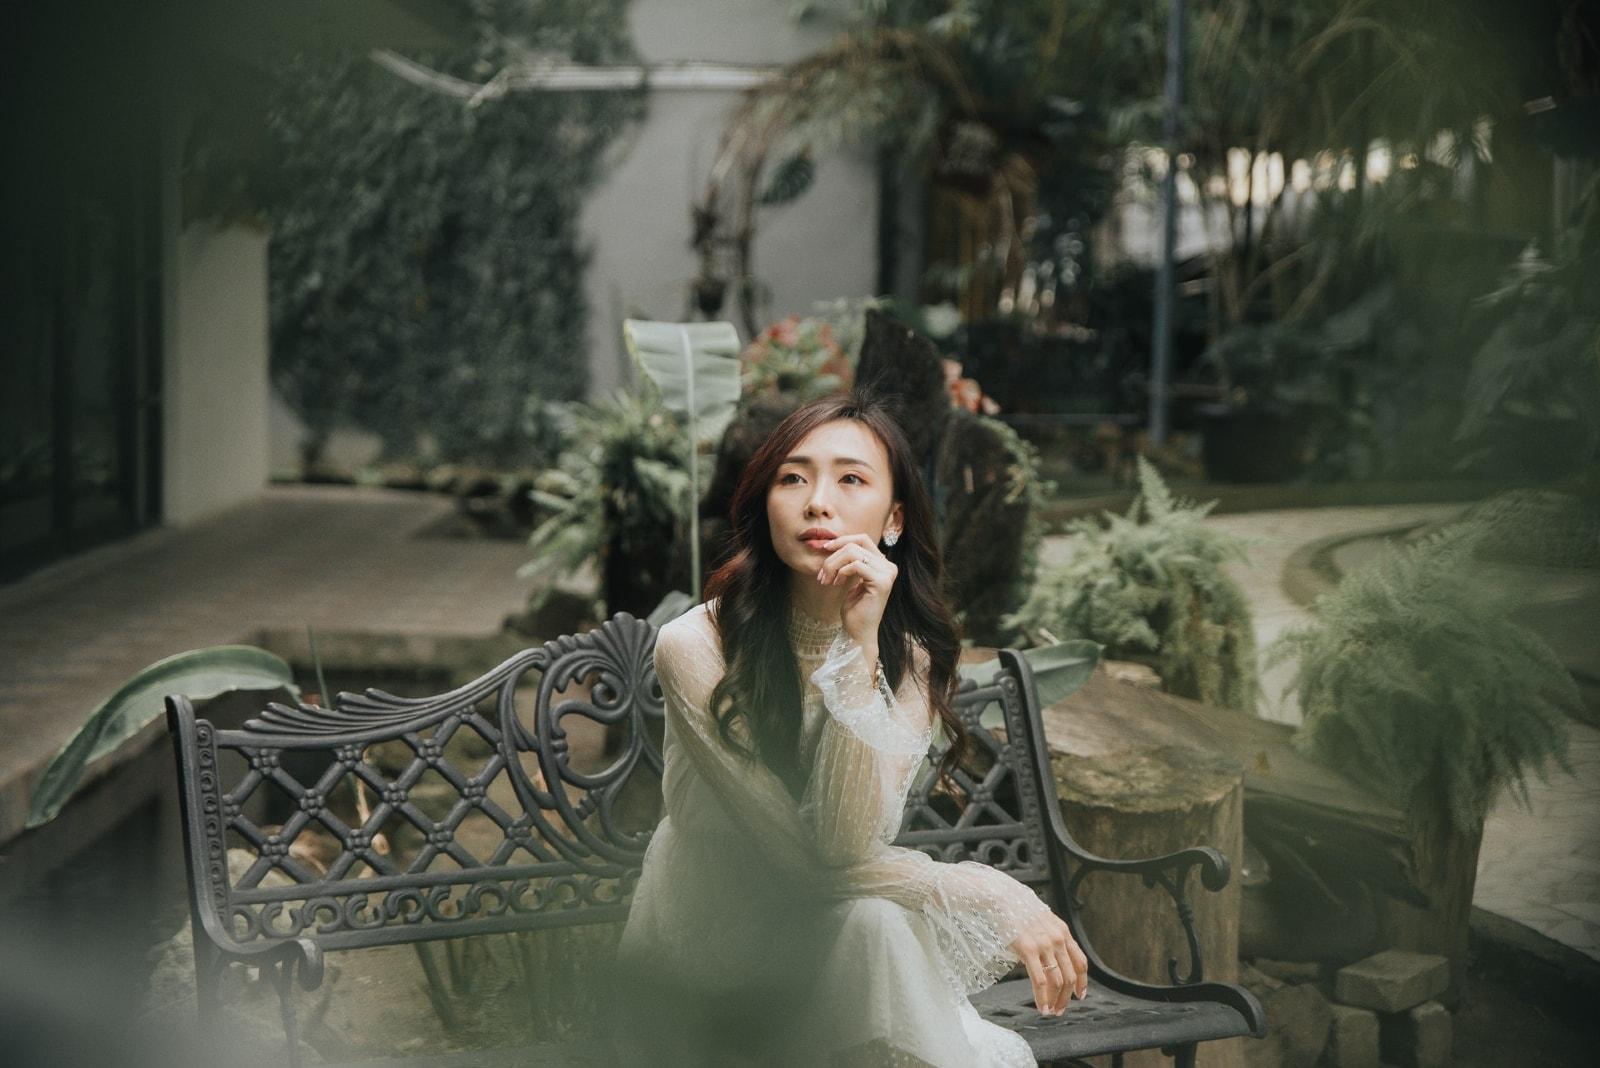 woman in white dress sitting on black metal bench